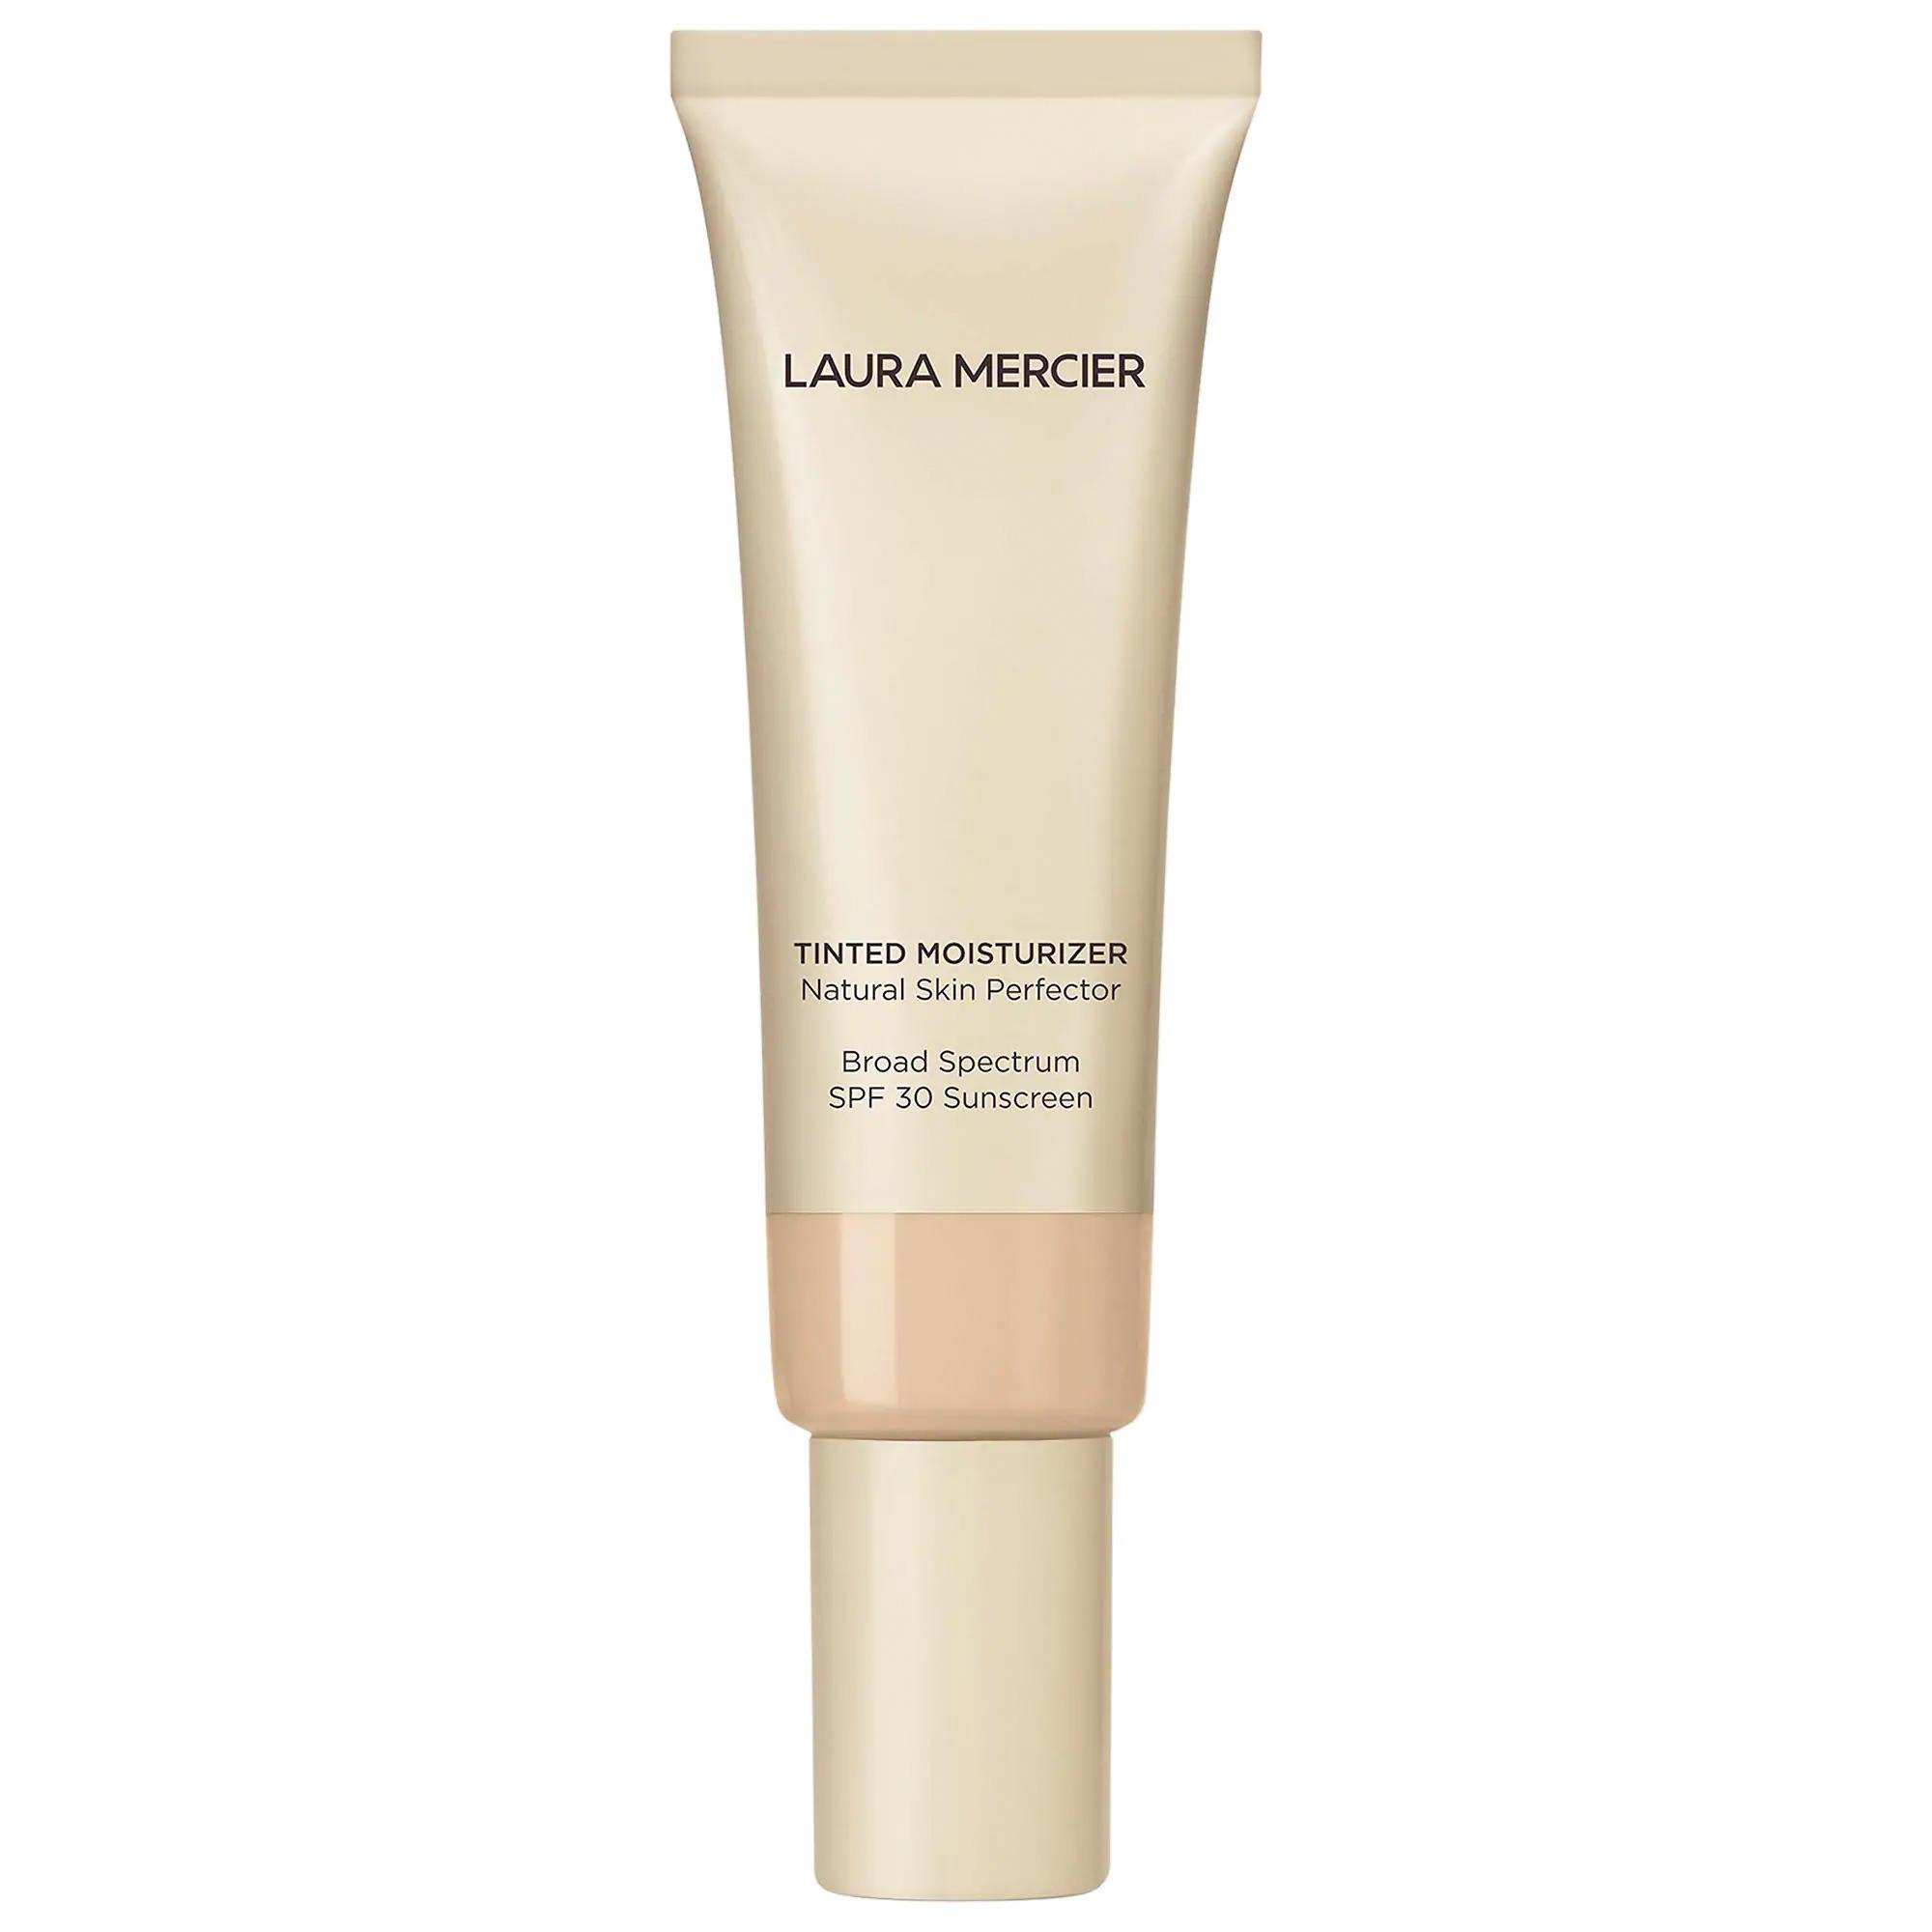 Laura Mercier Tinted Moisturizer Natural Skin Perfector Pearl 0W1